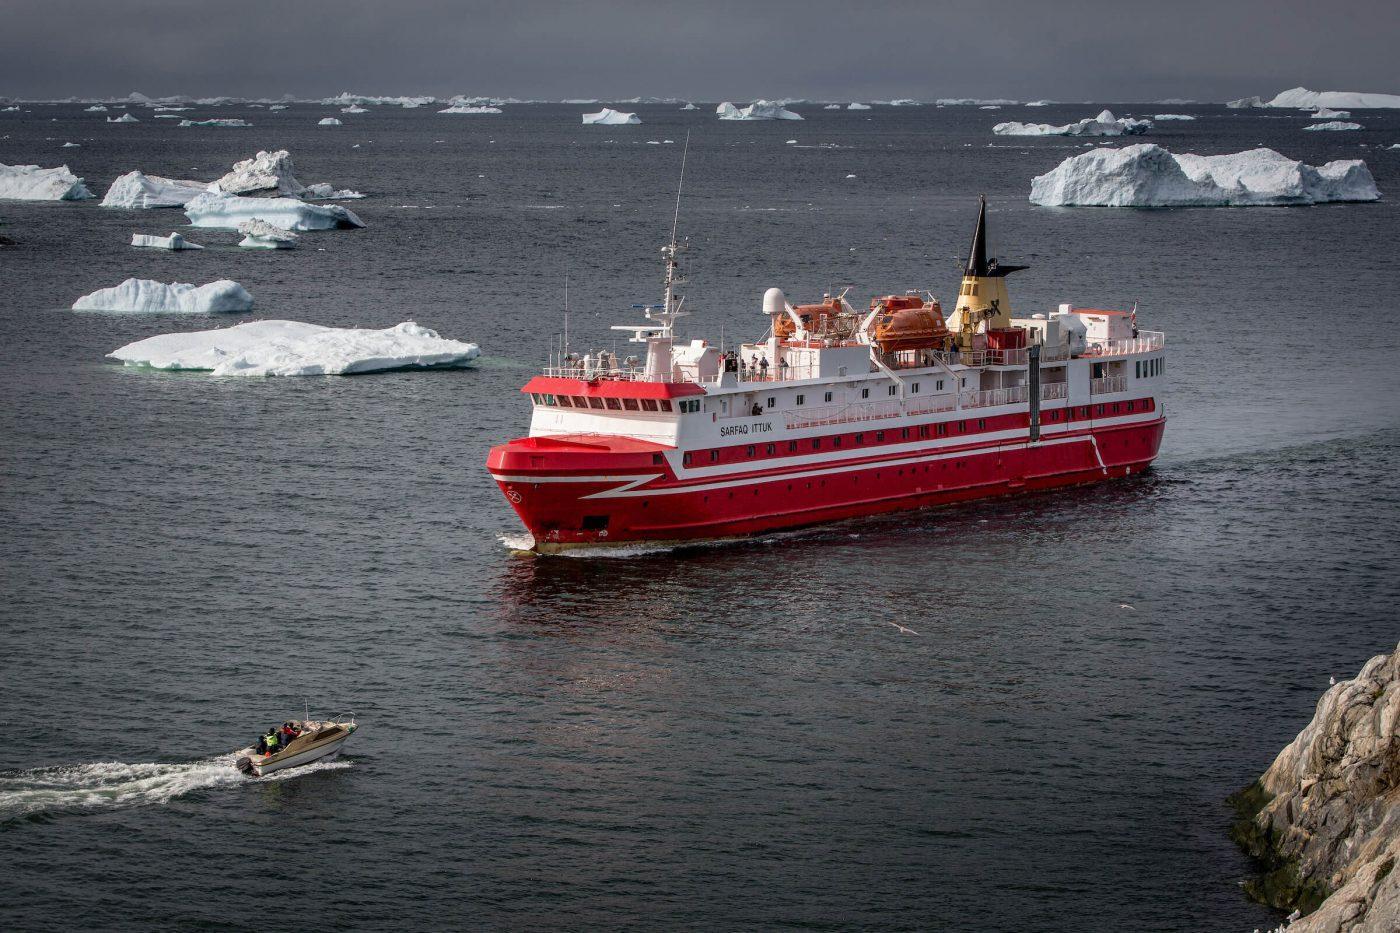 Sarfaq Ittuk arriving in Ilulissat in Greenland. By Mads Pihl